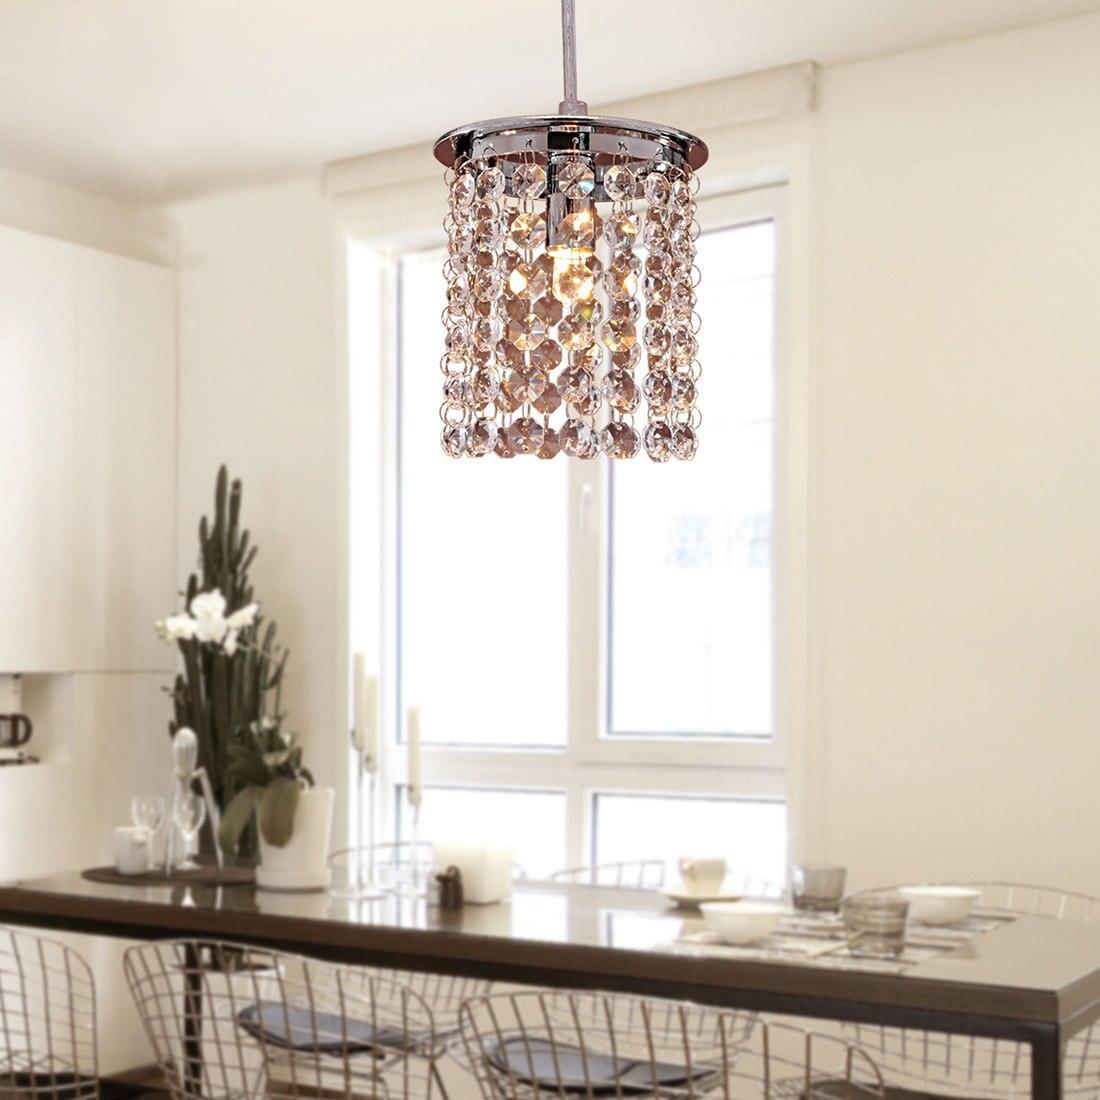 CSS Crystal Ceiling Light Modern Chandelier Kitchen Dining Room Fixture Ligh как купить ракуты в css